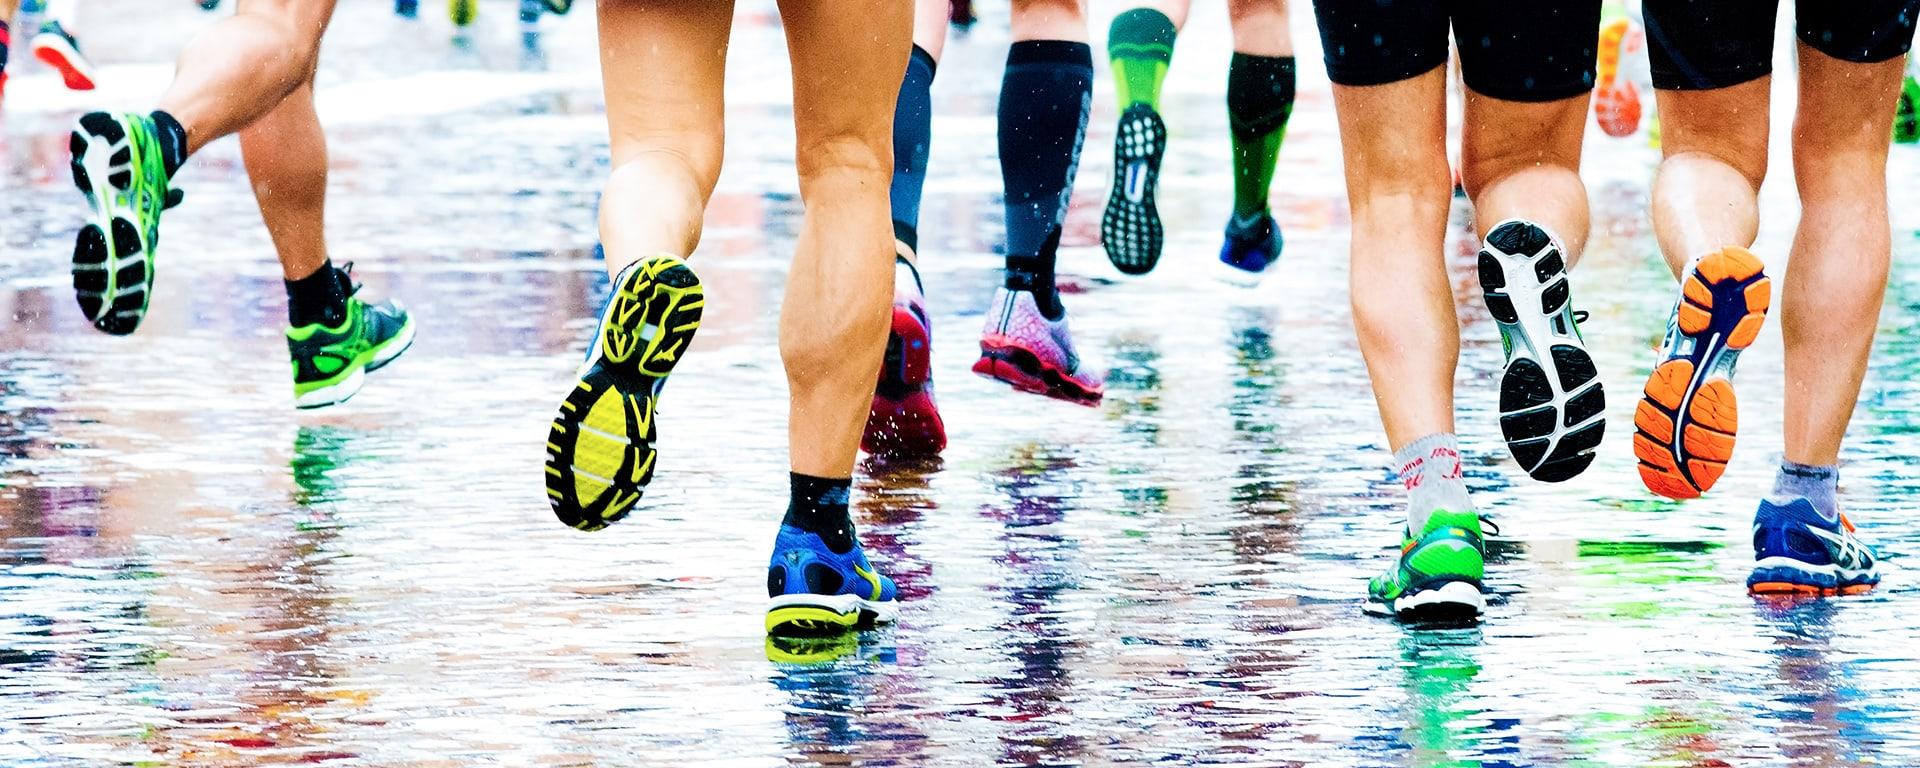 Process of Running - Image of feet running